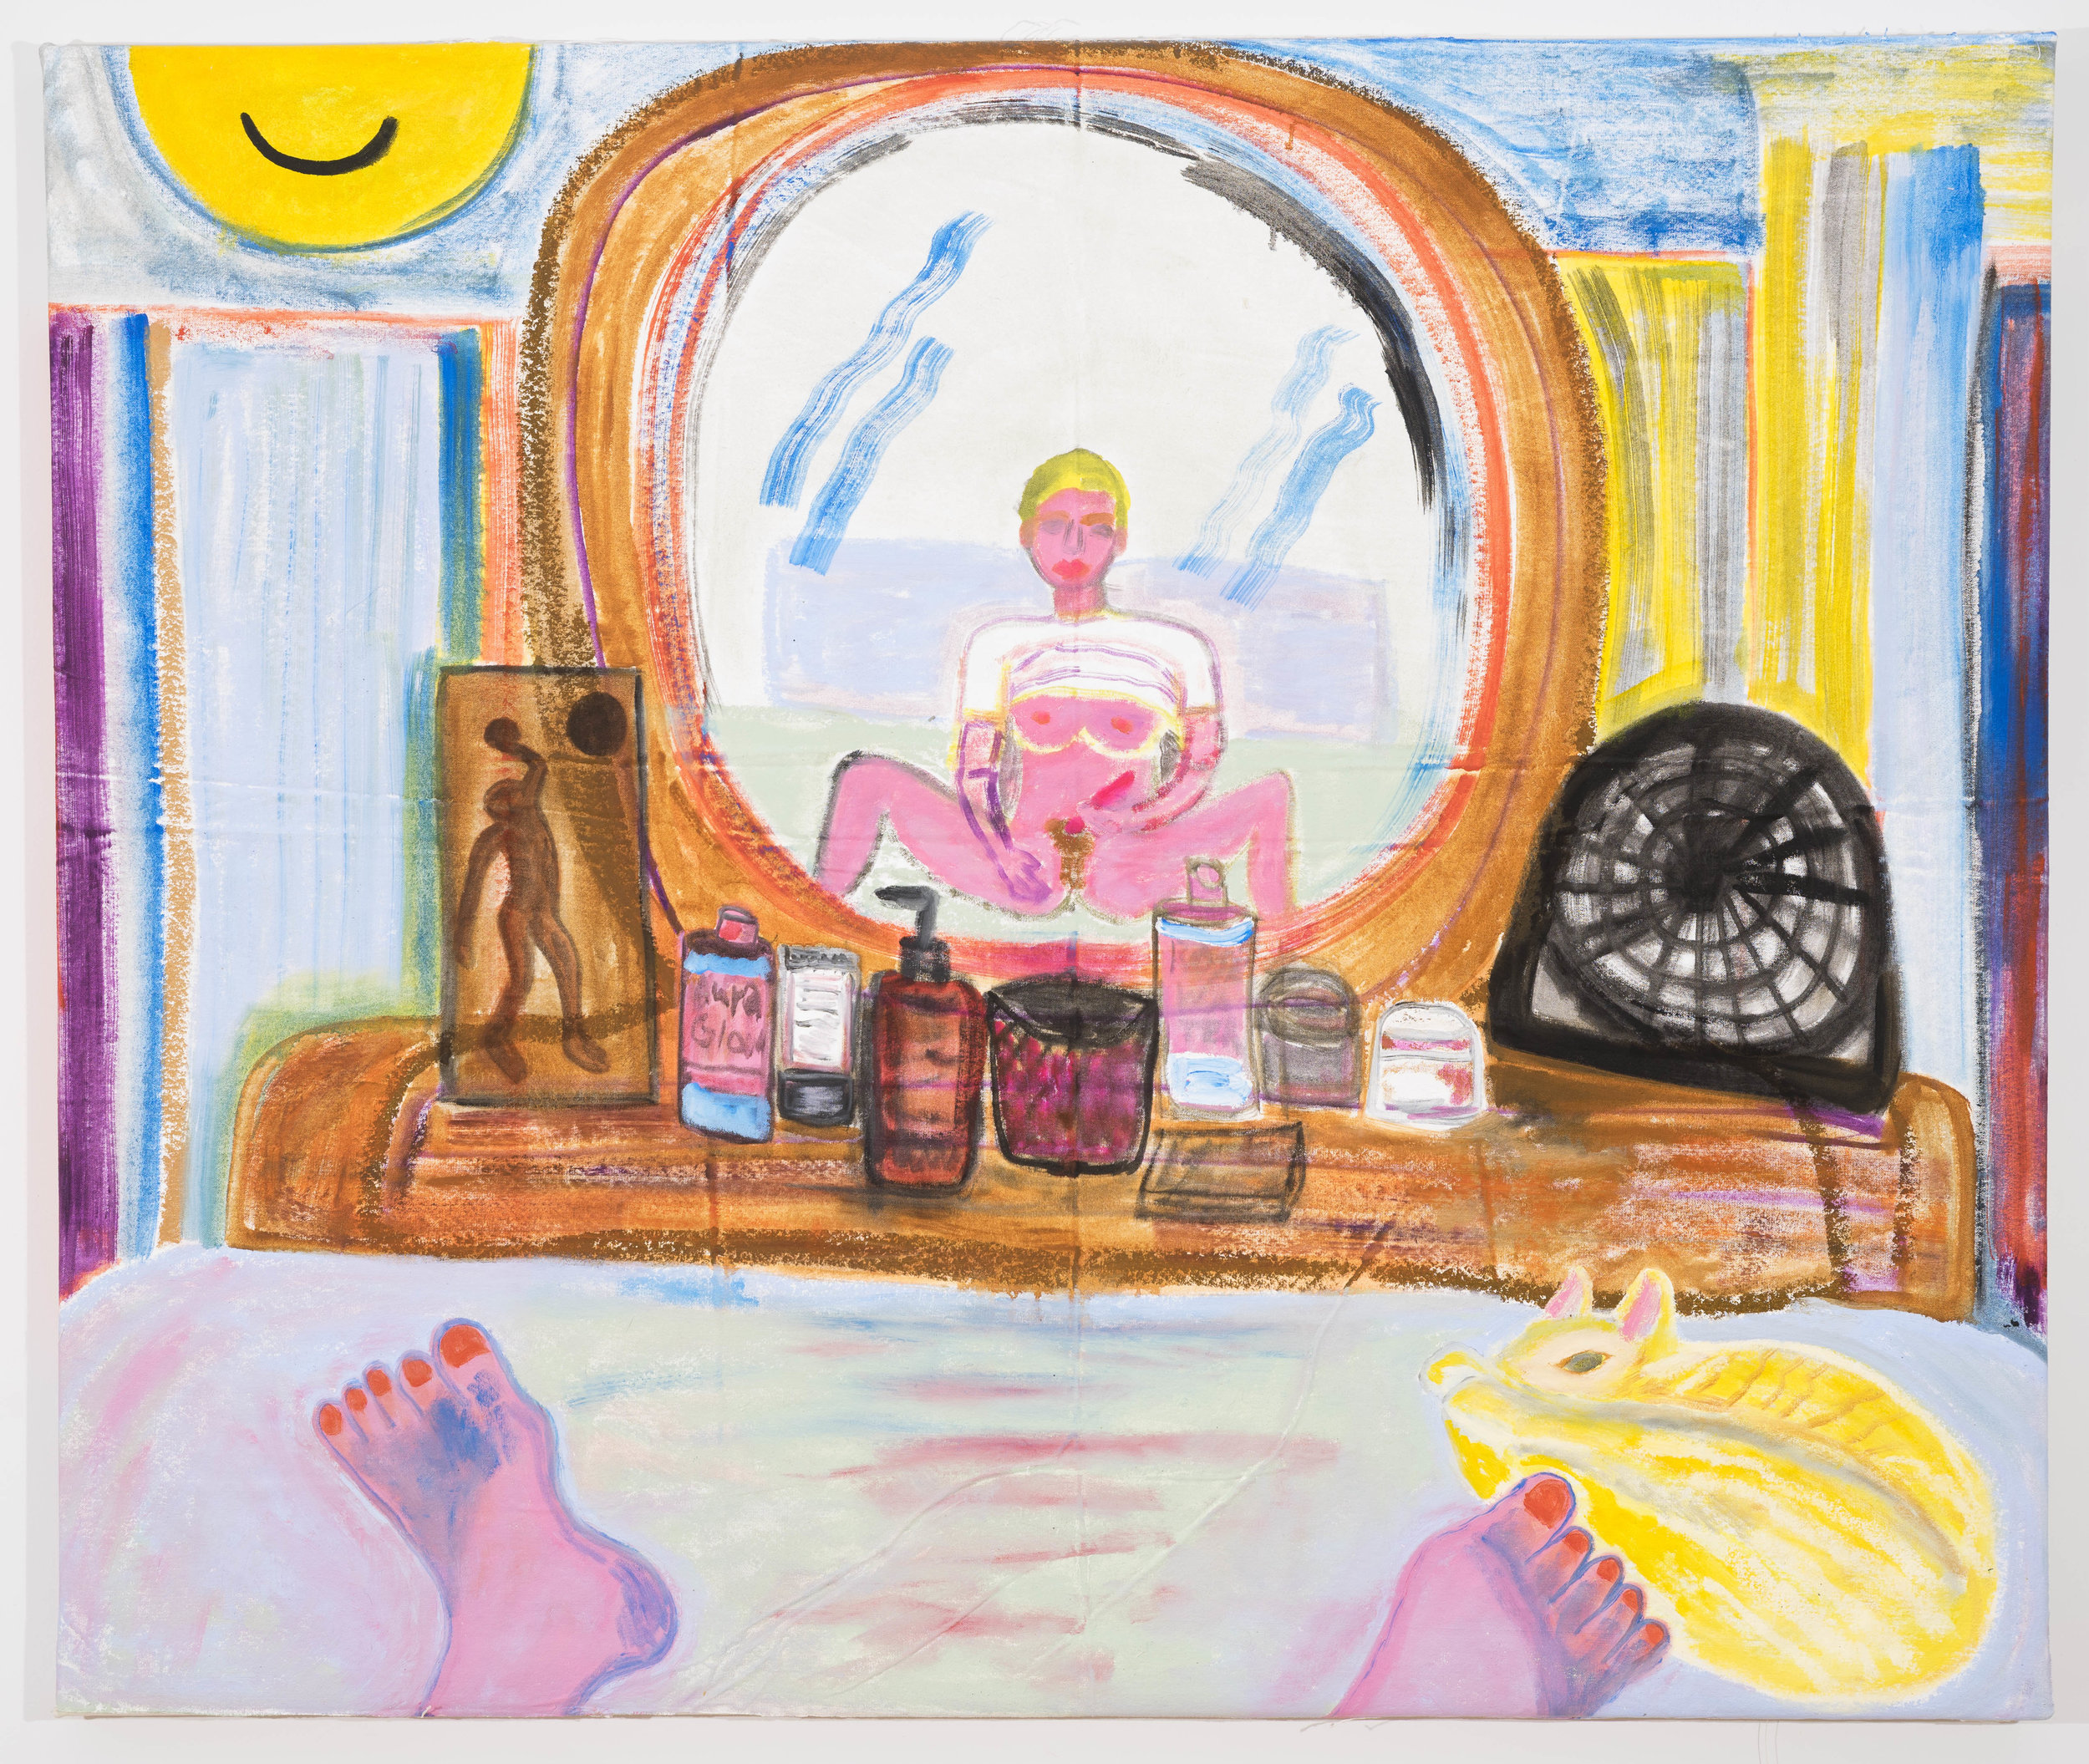 Jennifer Sullivan  Smile  2018 Oil and oil stick on canvas 42 x 50 inches